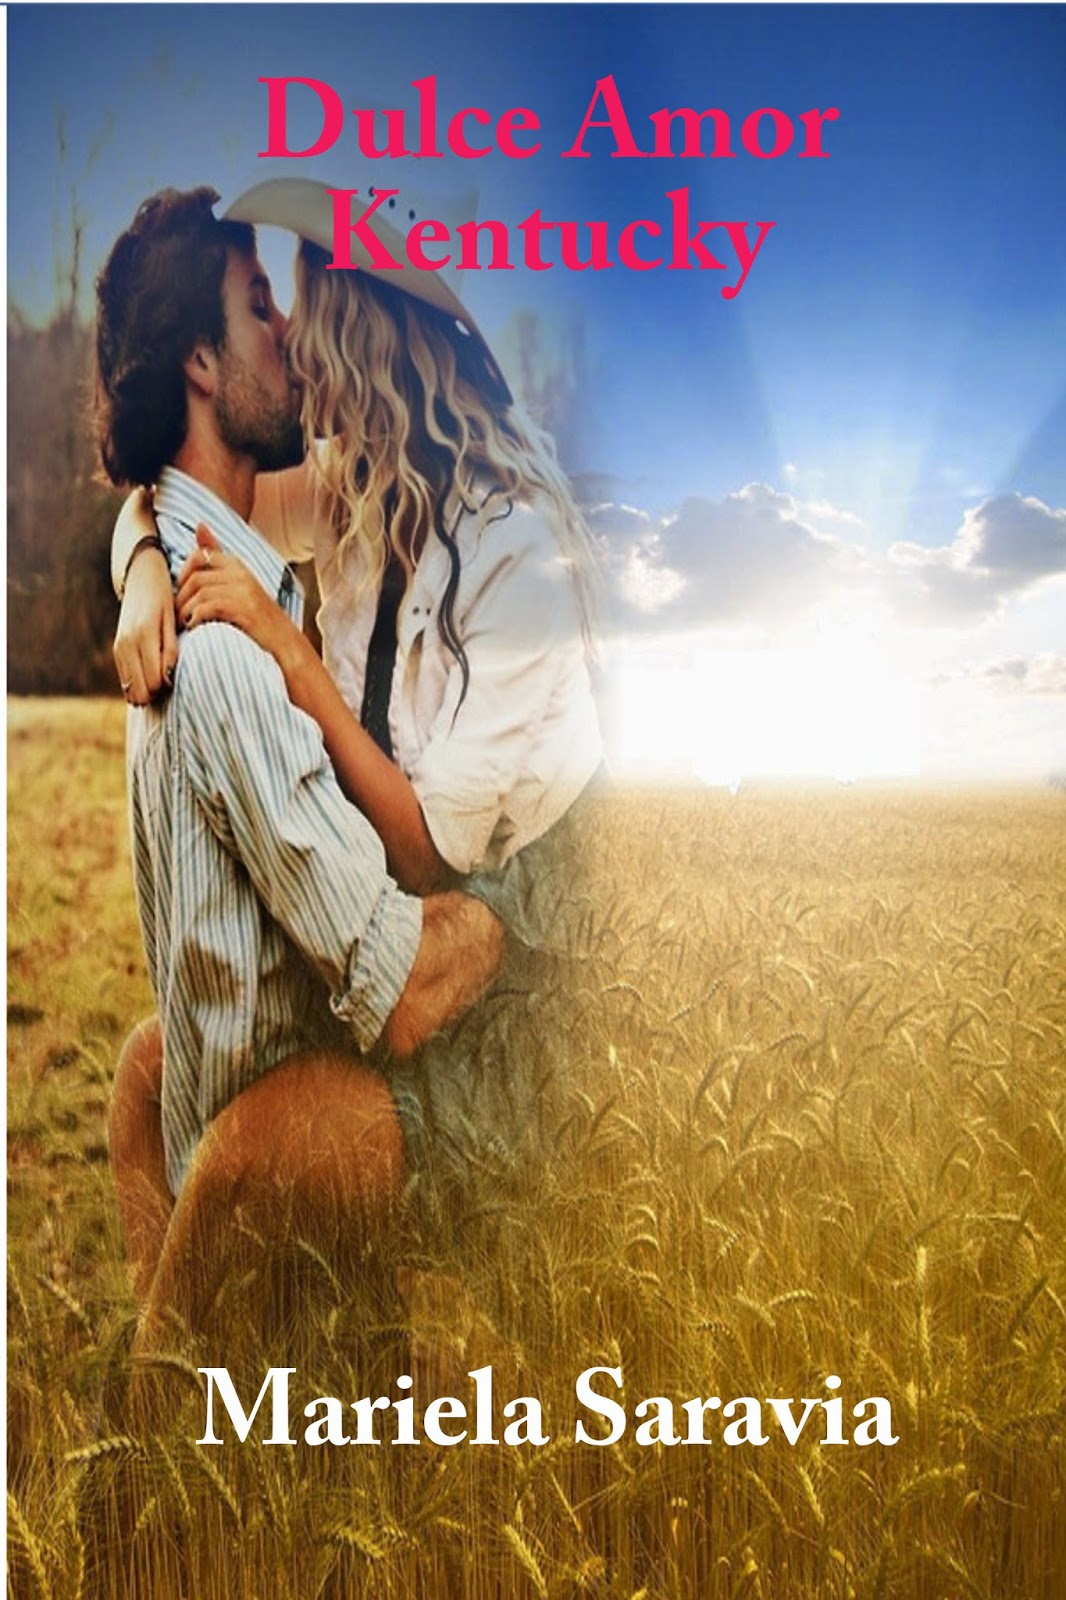 Dulce amor Kentucky - Mariela Saravia (Rom) Kentucky+(1)